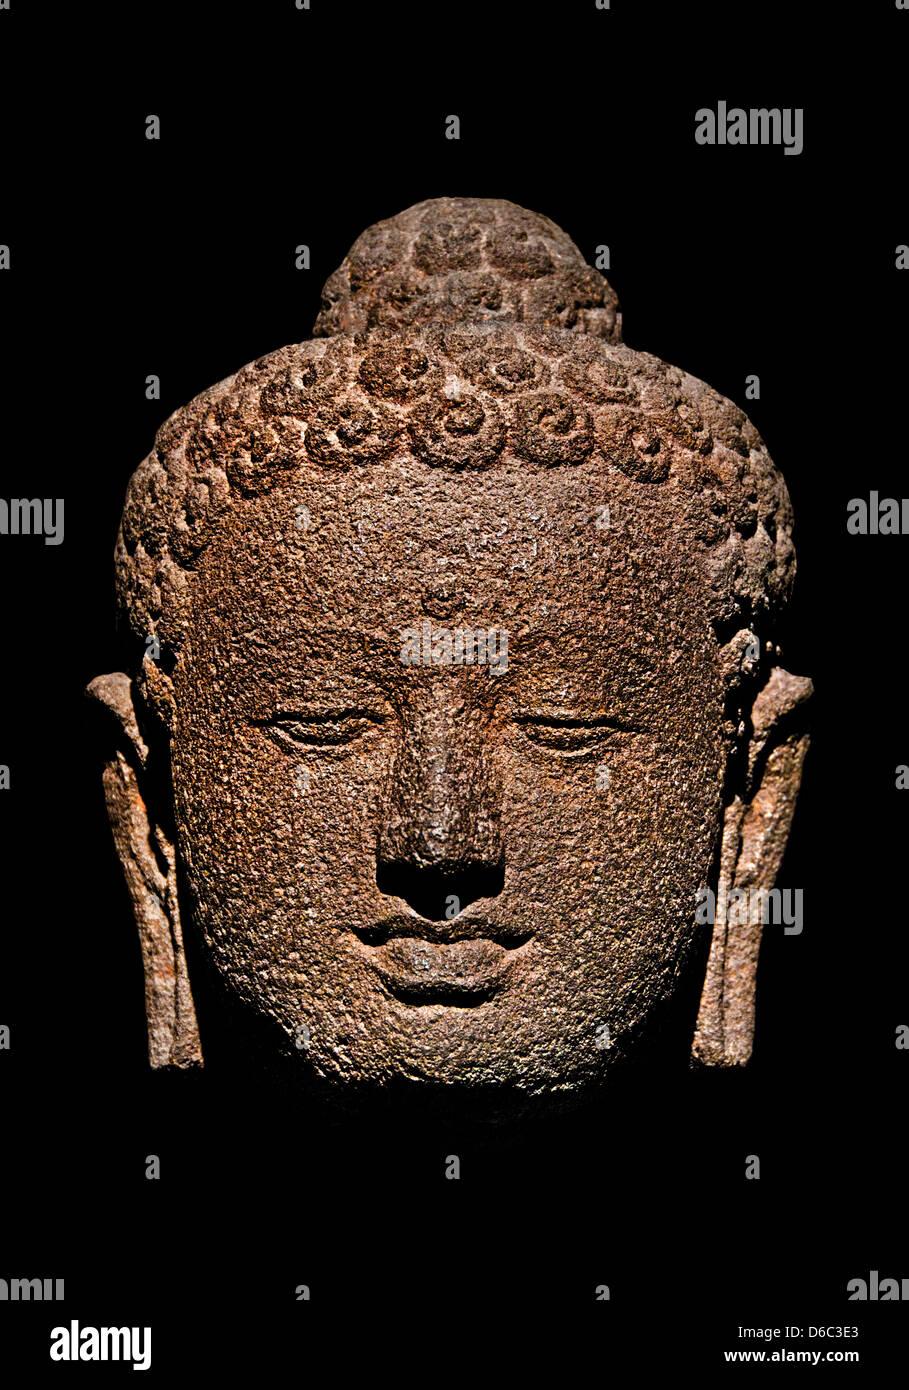 Jina Candi Borobudur Central Java 7 - 9 century  Andesite Indonesia Stock Photo